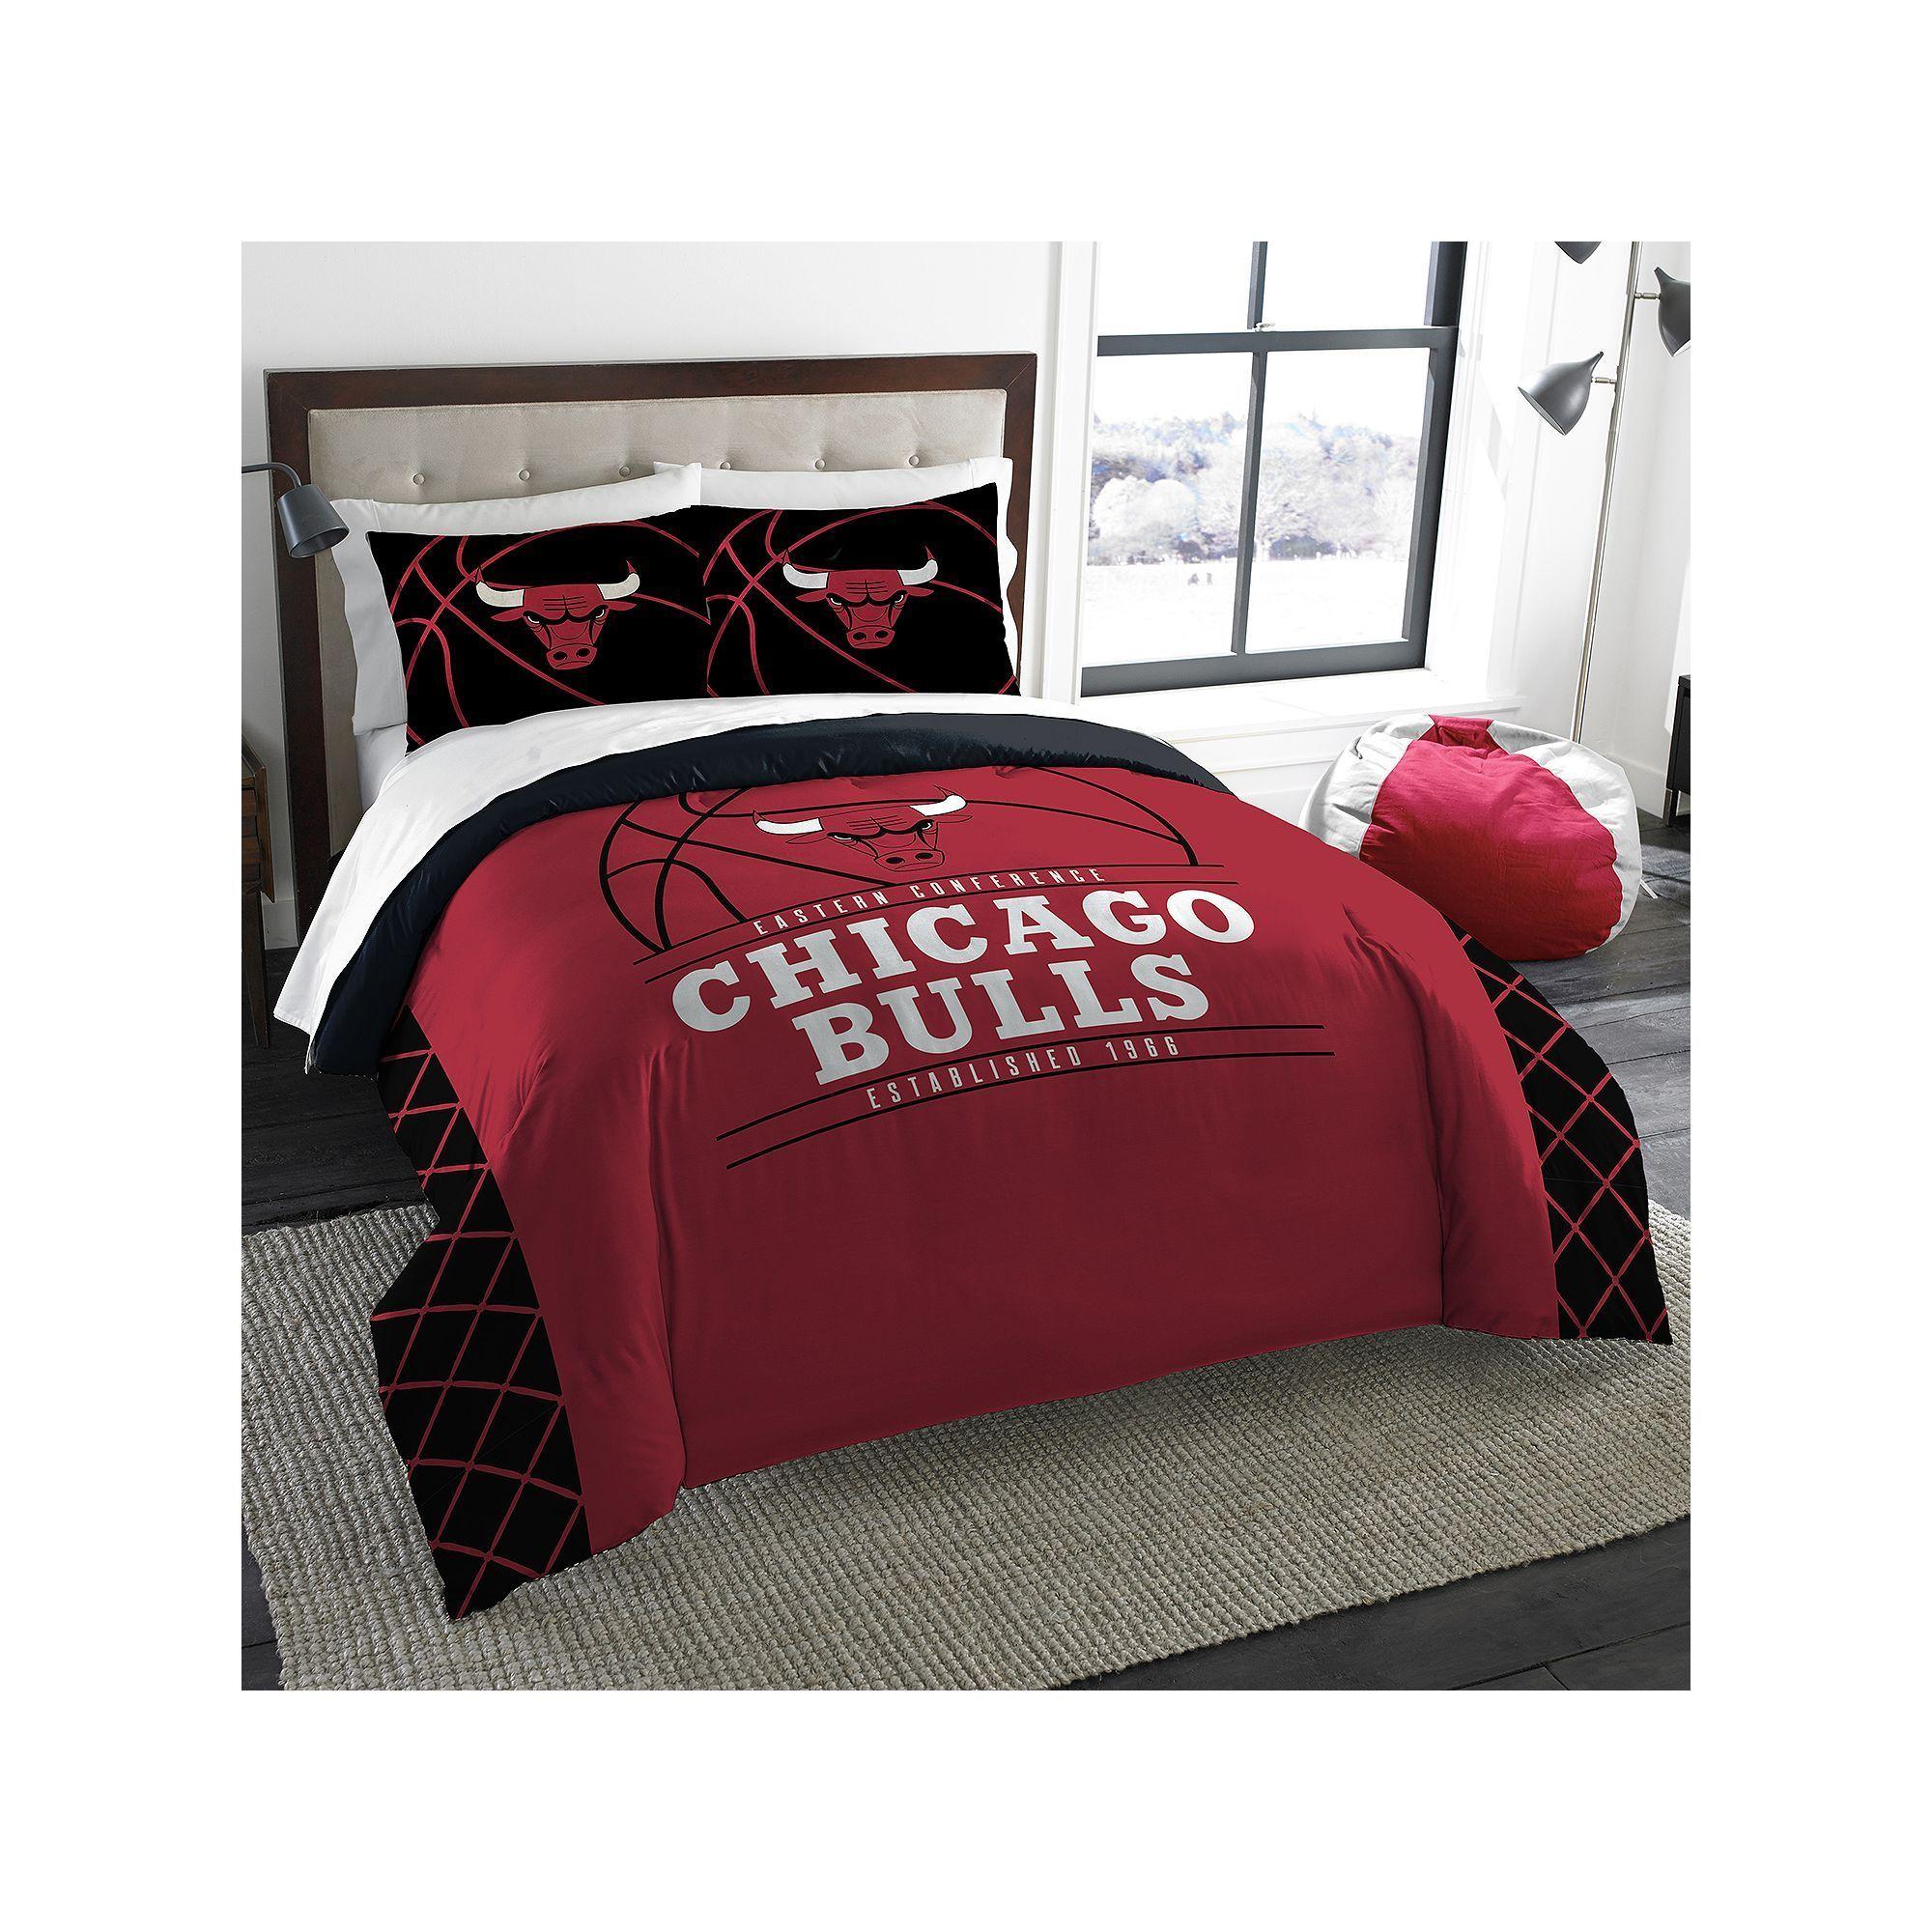 Chicago bulls reverse slam fullqueen comforter set by